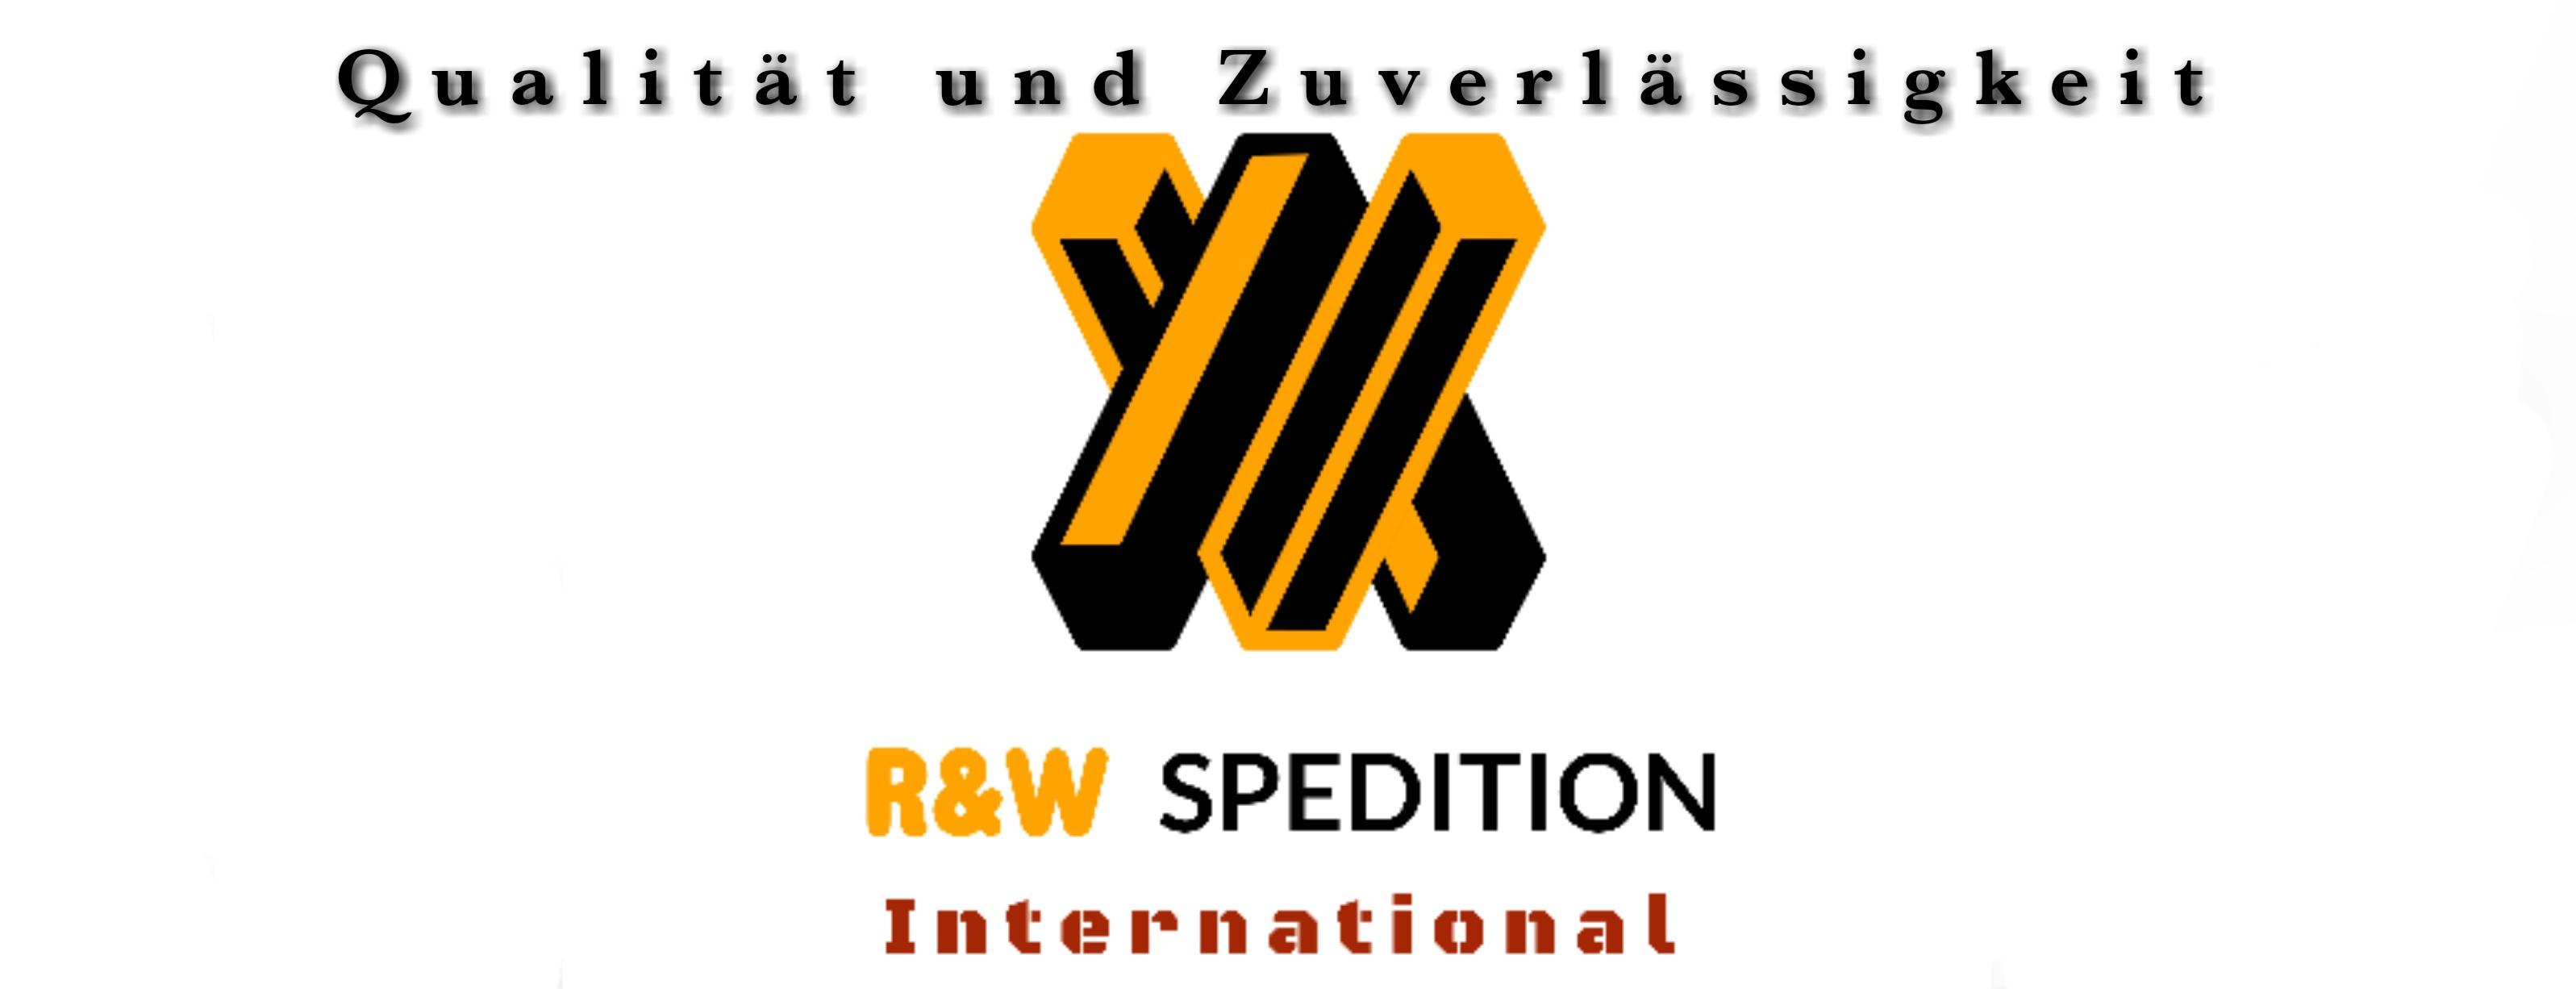 R&W Spedition